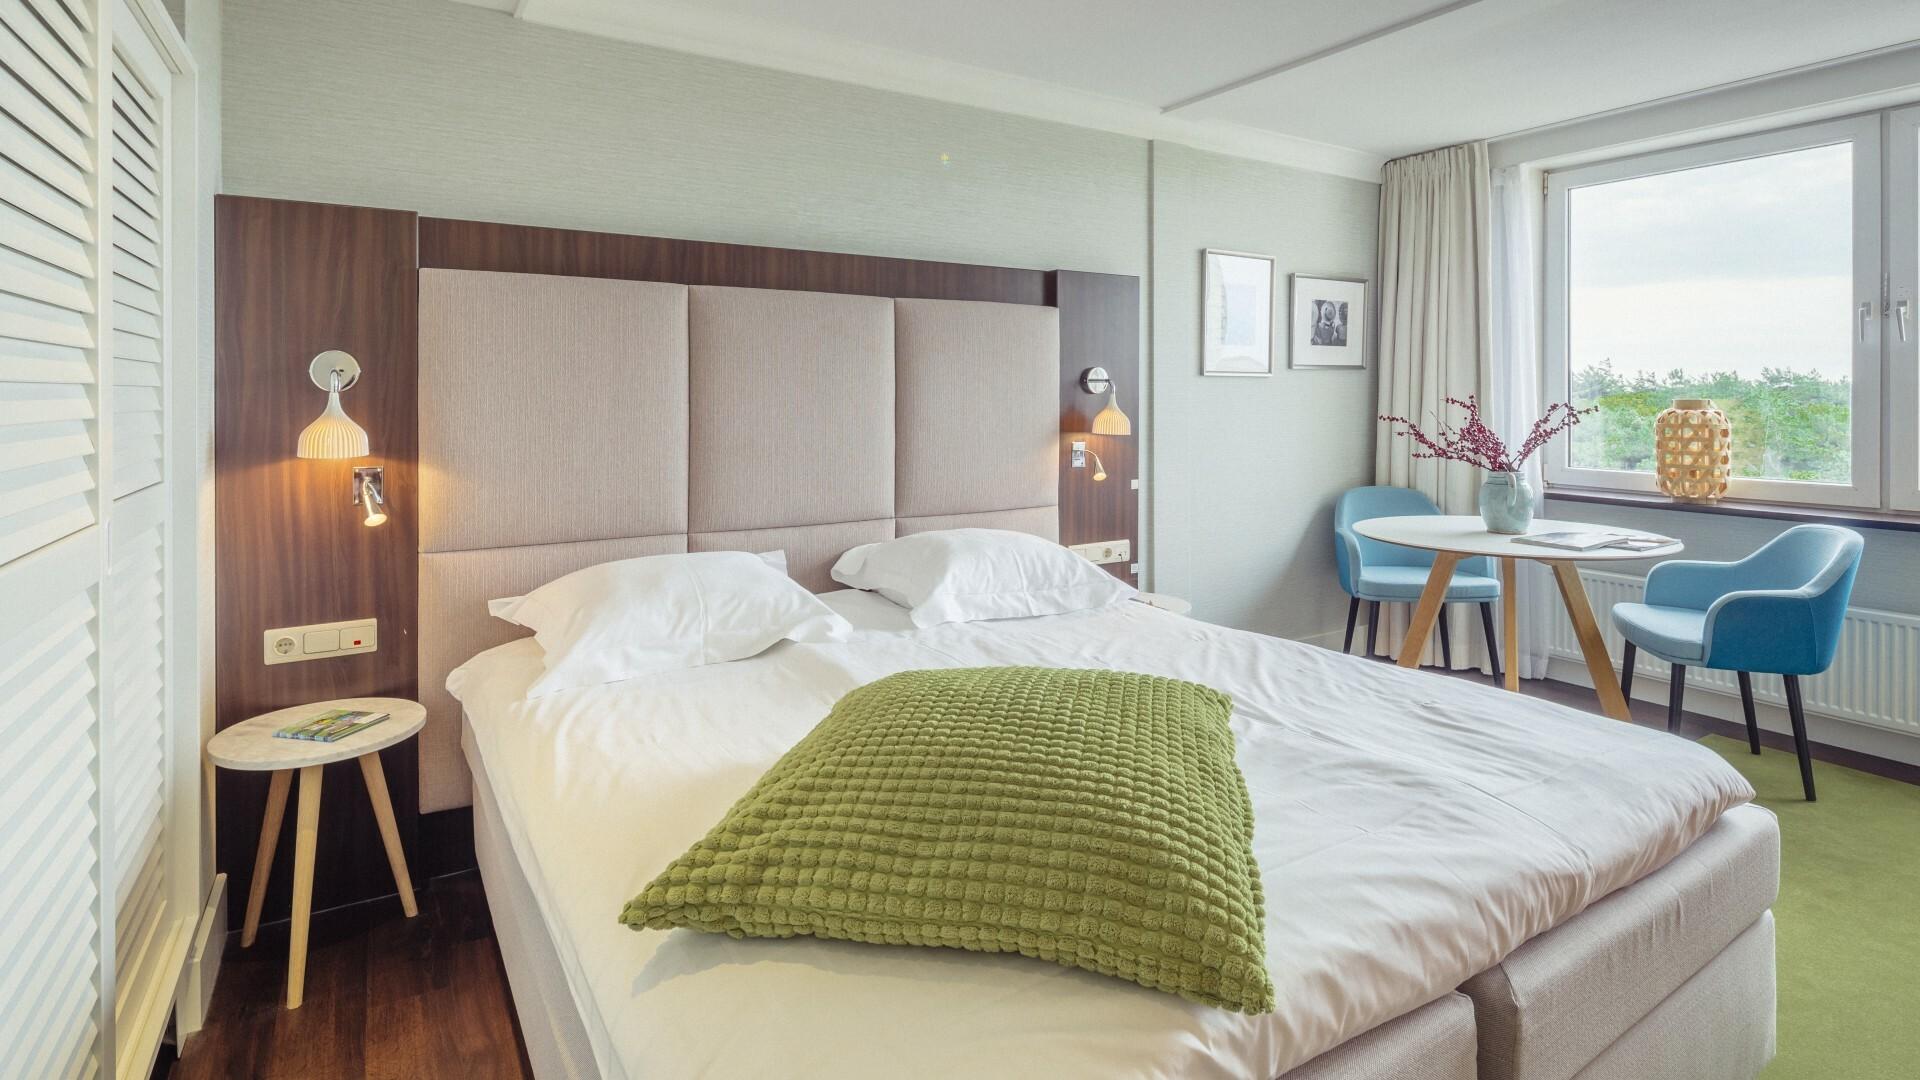 Tweepersoonskamer van Hotel Opduin VVV Texel